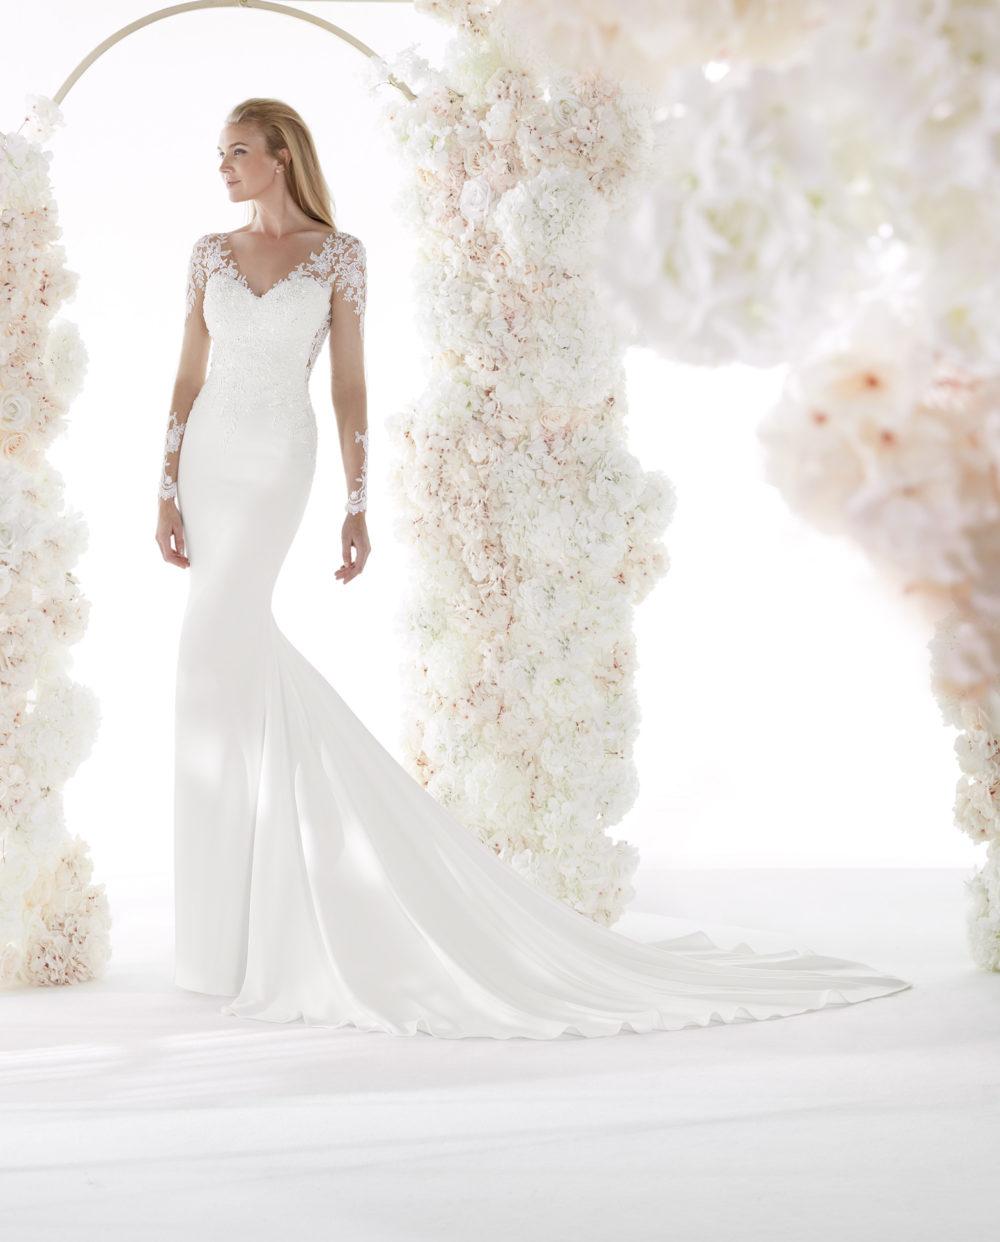 Mariages: abito da sposa Colet 2020 a Vicenza, Verona, Padova, Veneto COA20201